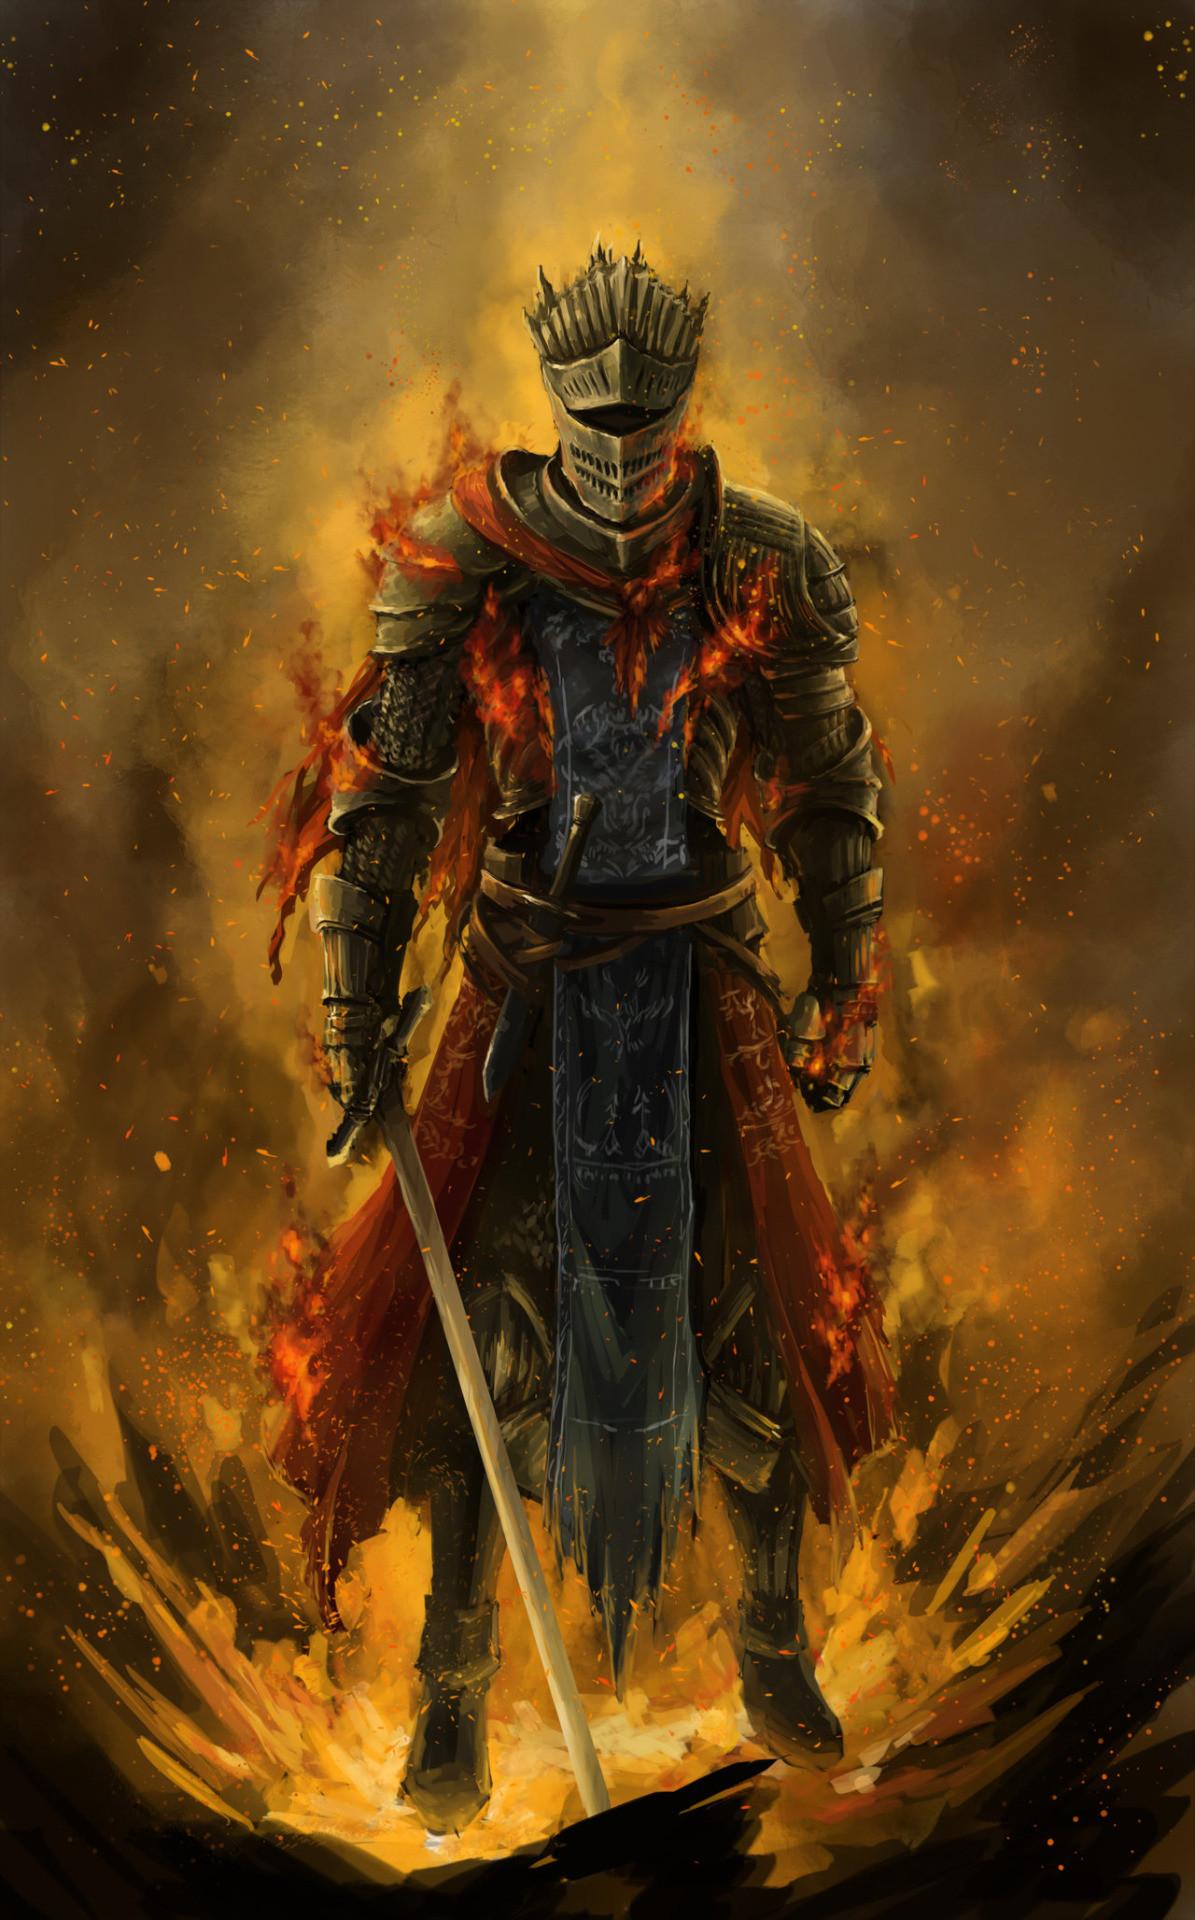 dark souls 3 red knight – Google Search —– The Dark Souls